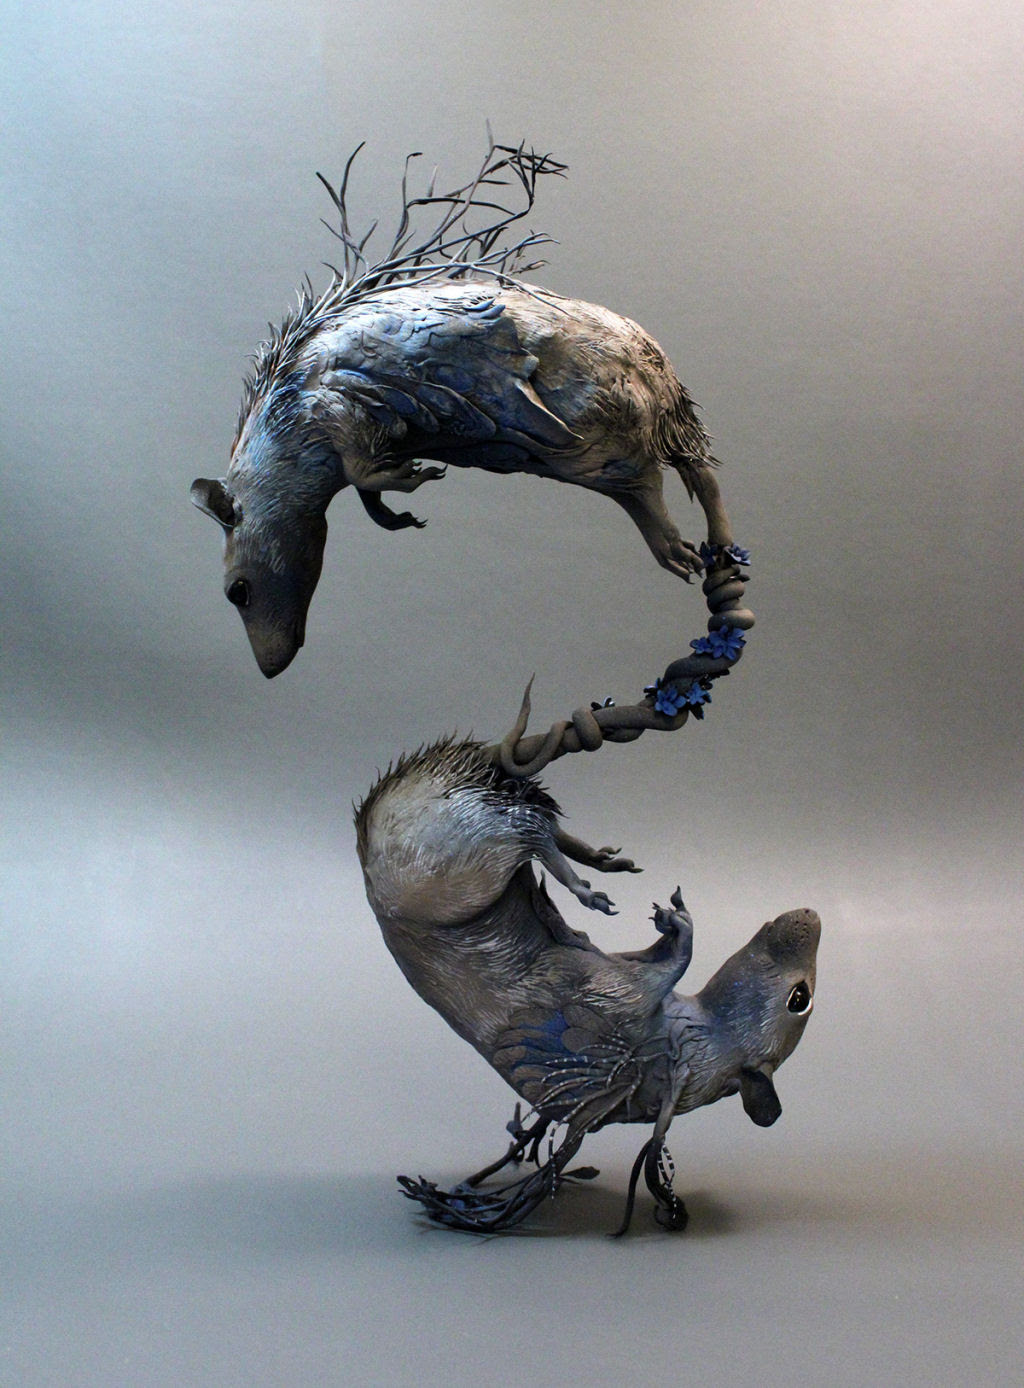 As esculturas surrealistas de Ellen Jewett mesclam plantas e vida animal 06